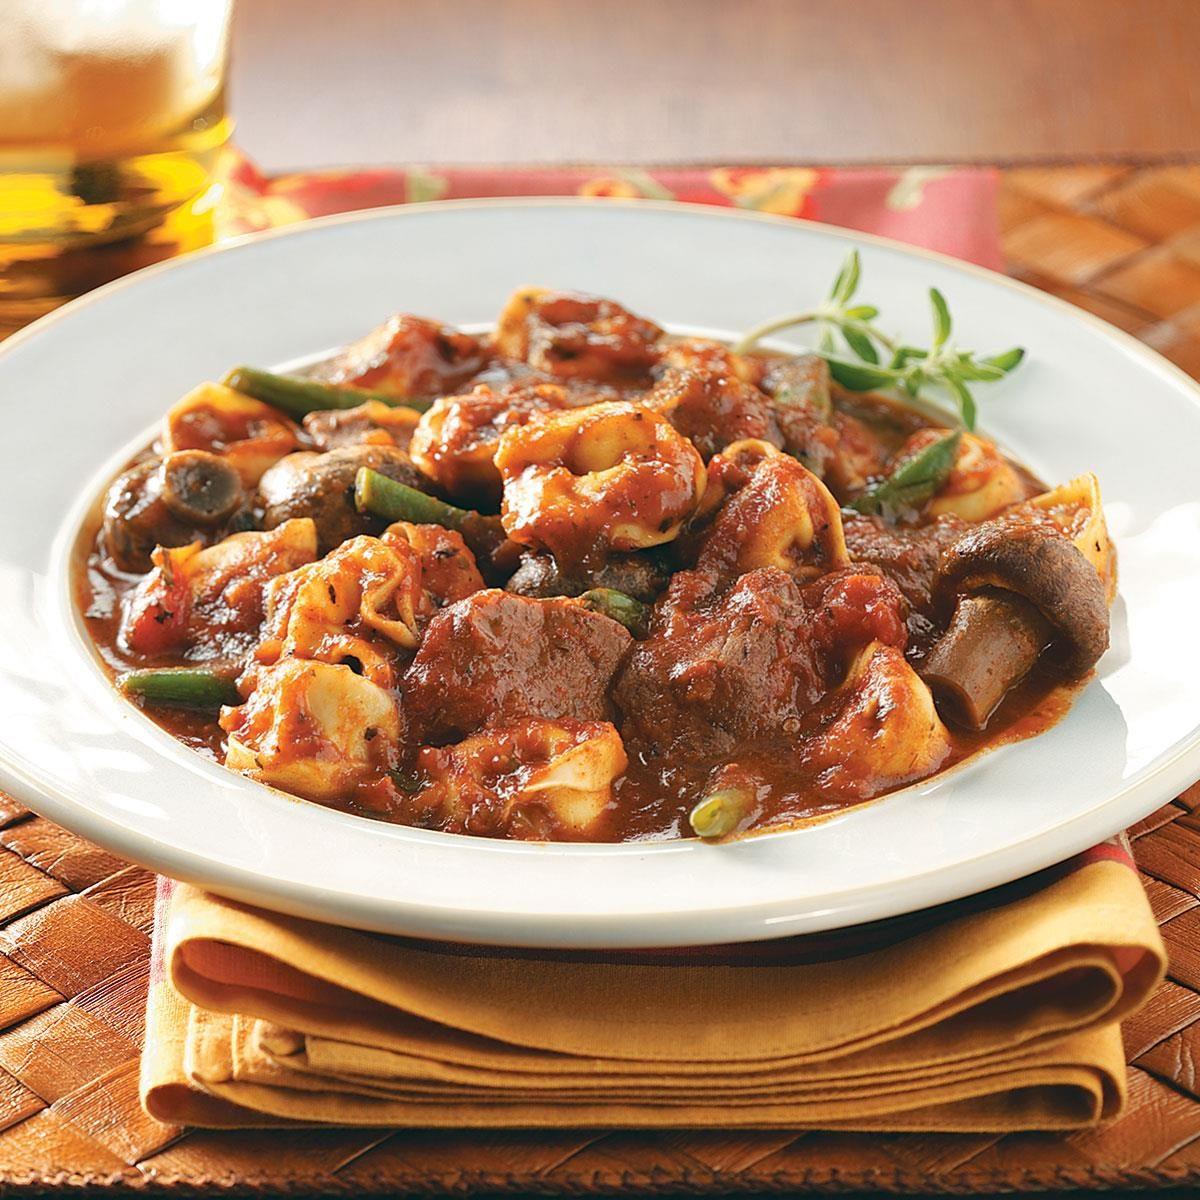 Beef & Tortellini Marinara with Green Beans